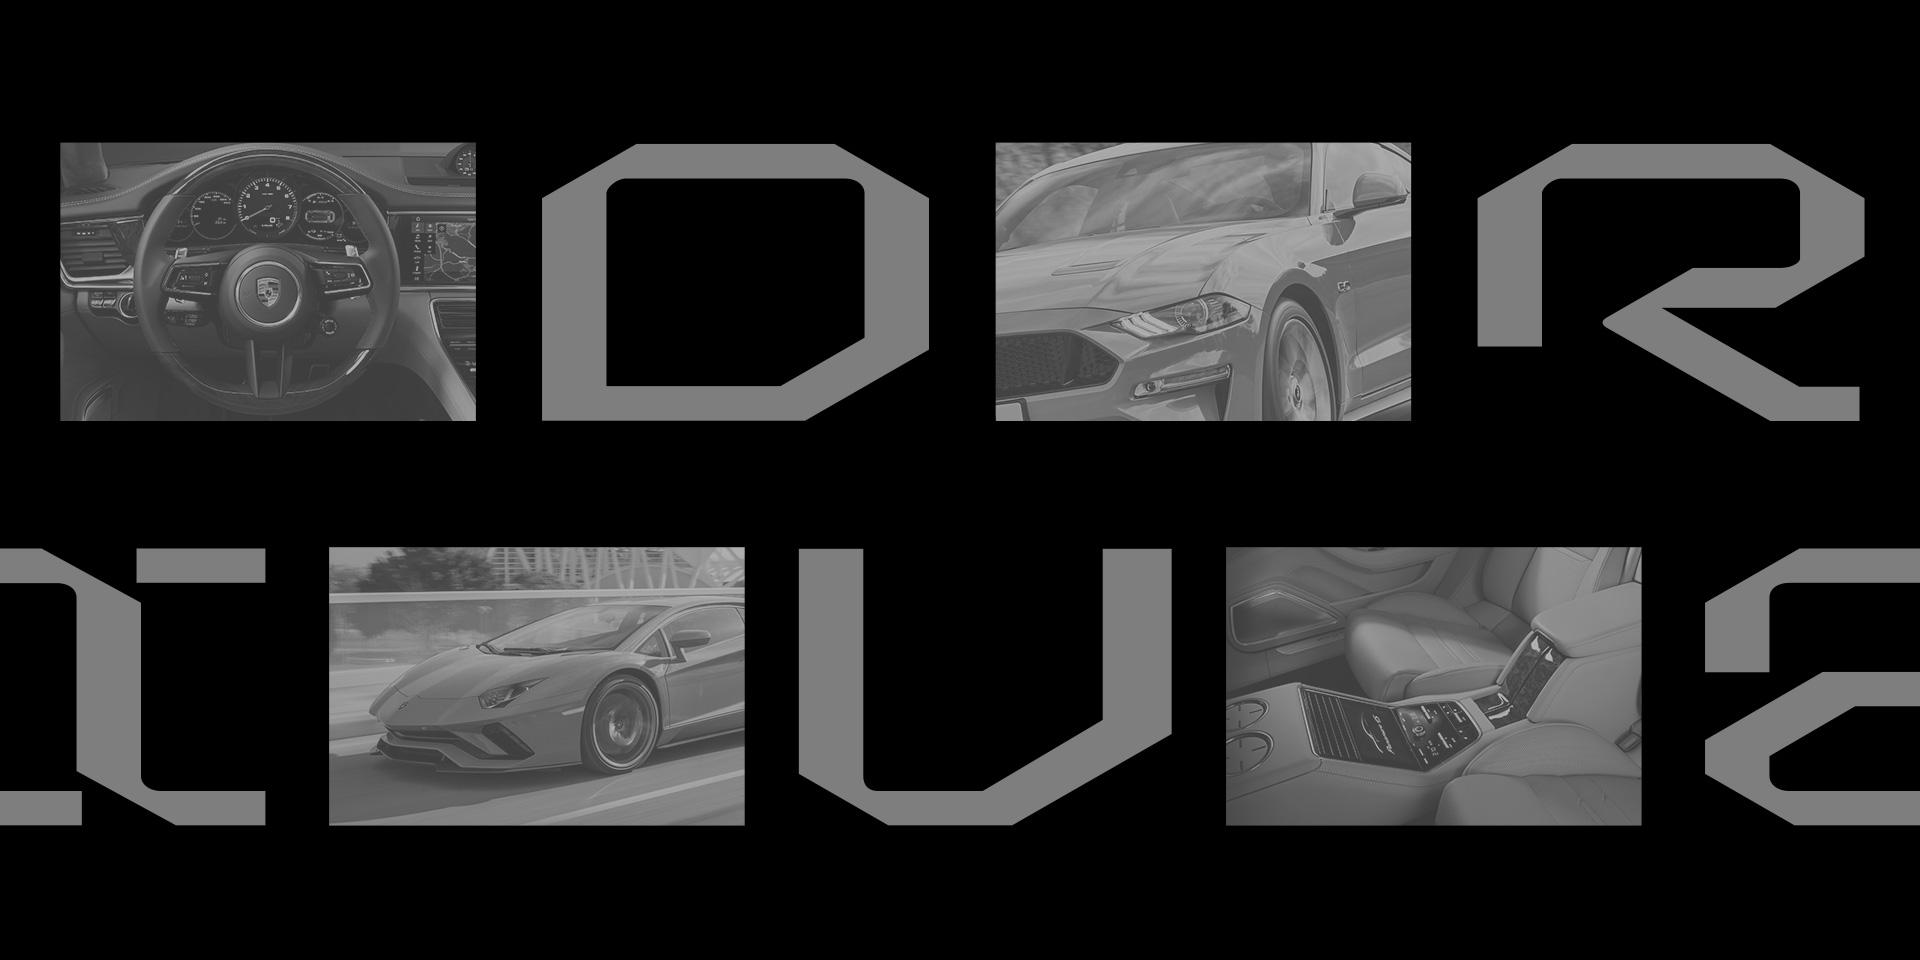 Drive Club Brand Corporate Identity Designed by Estúdio Kuumba